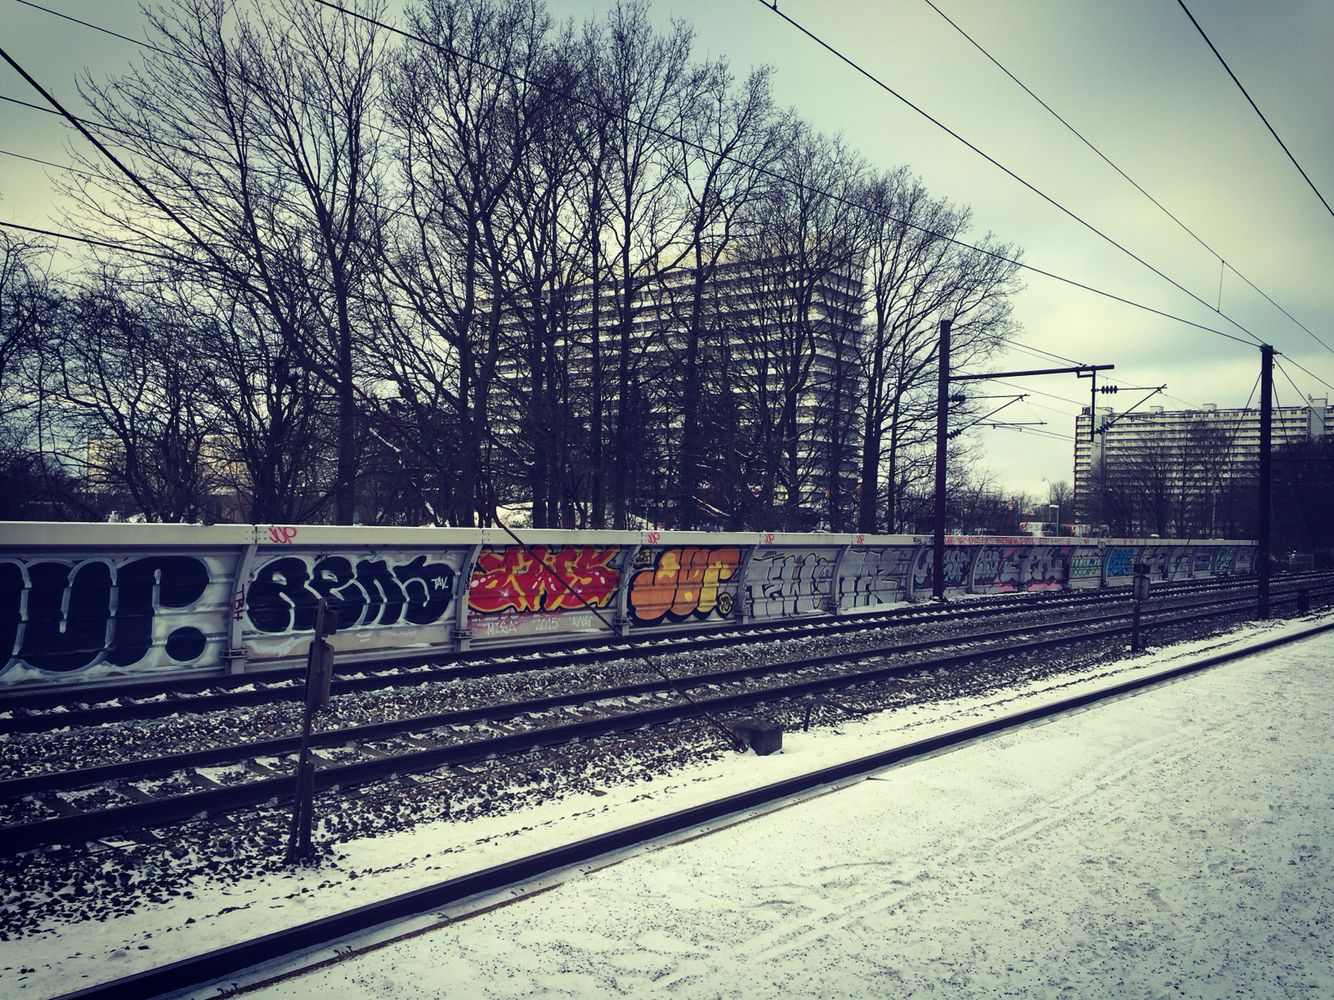 Train station vibes☁️